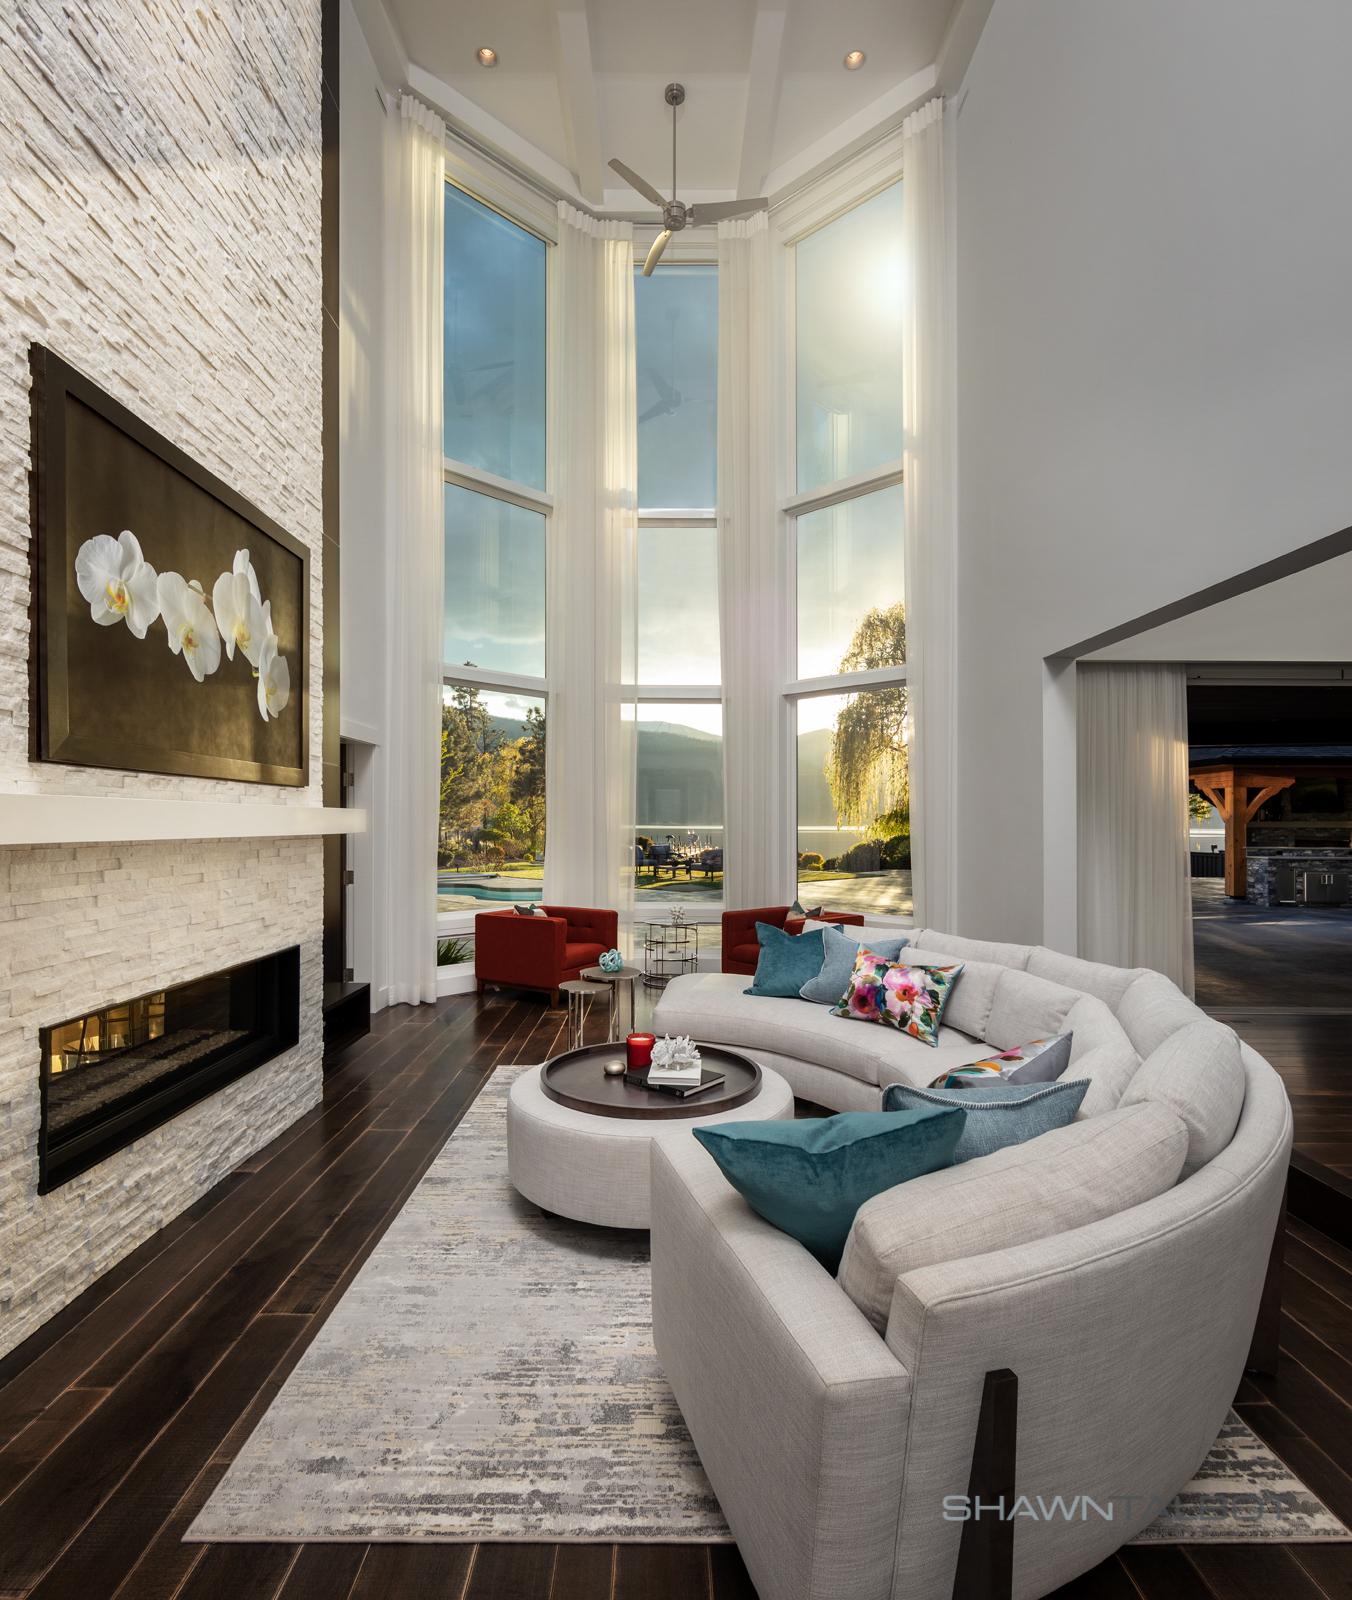 Shawn Talbot Architectural Photographer Living Room Lighting Interior